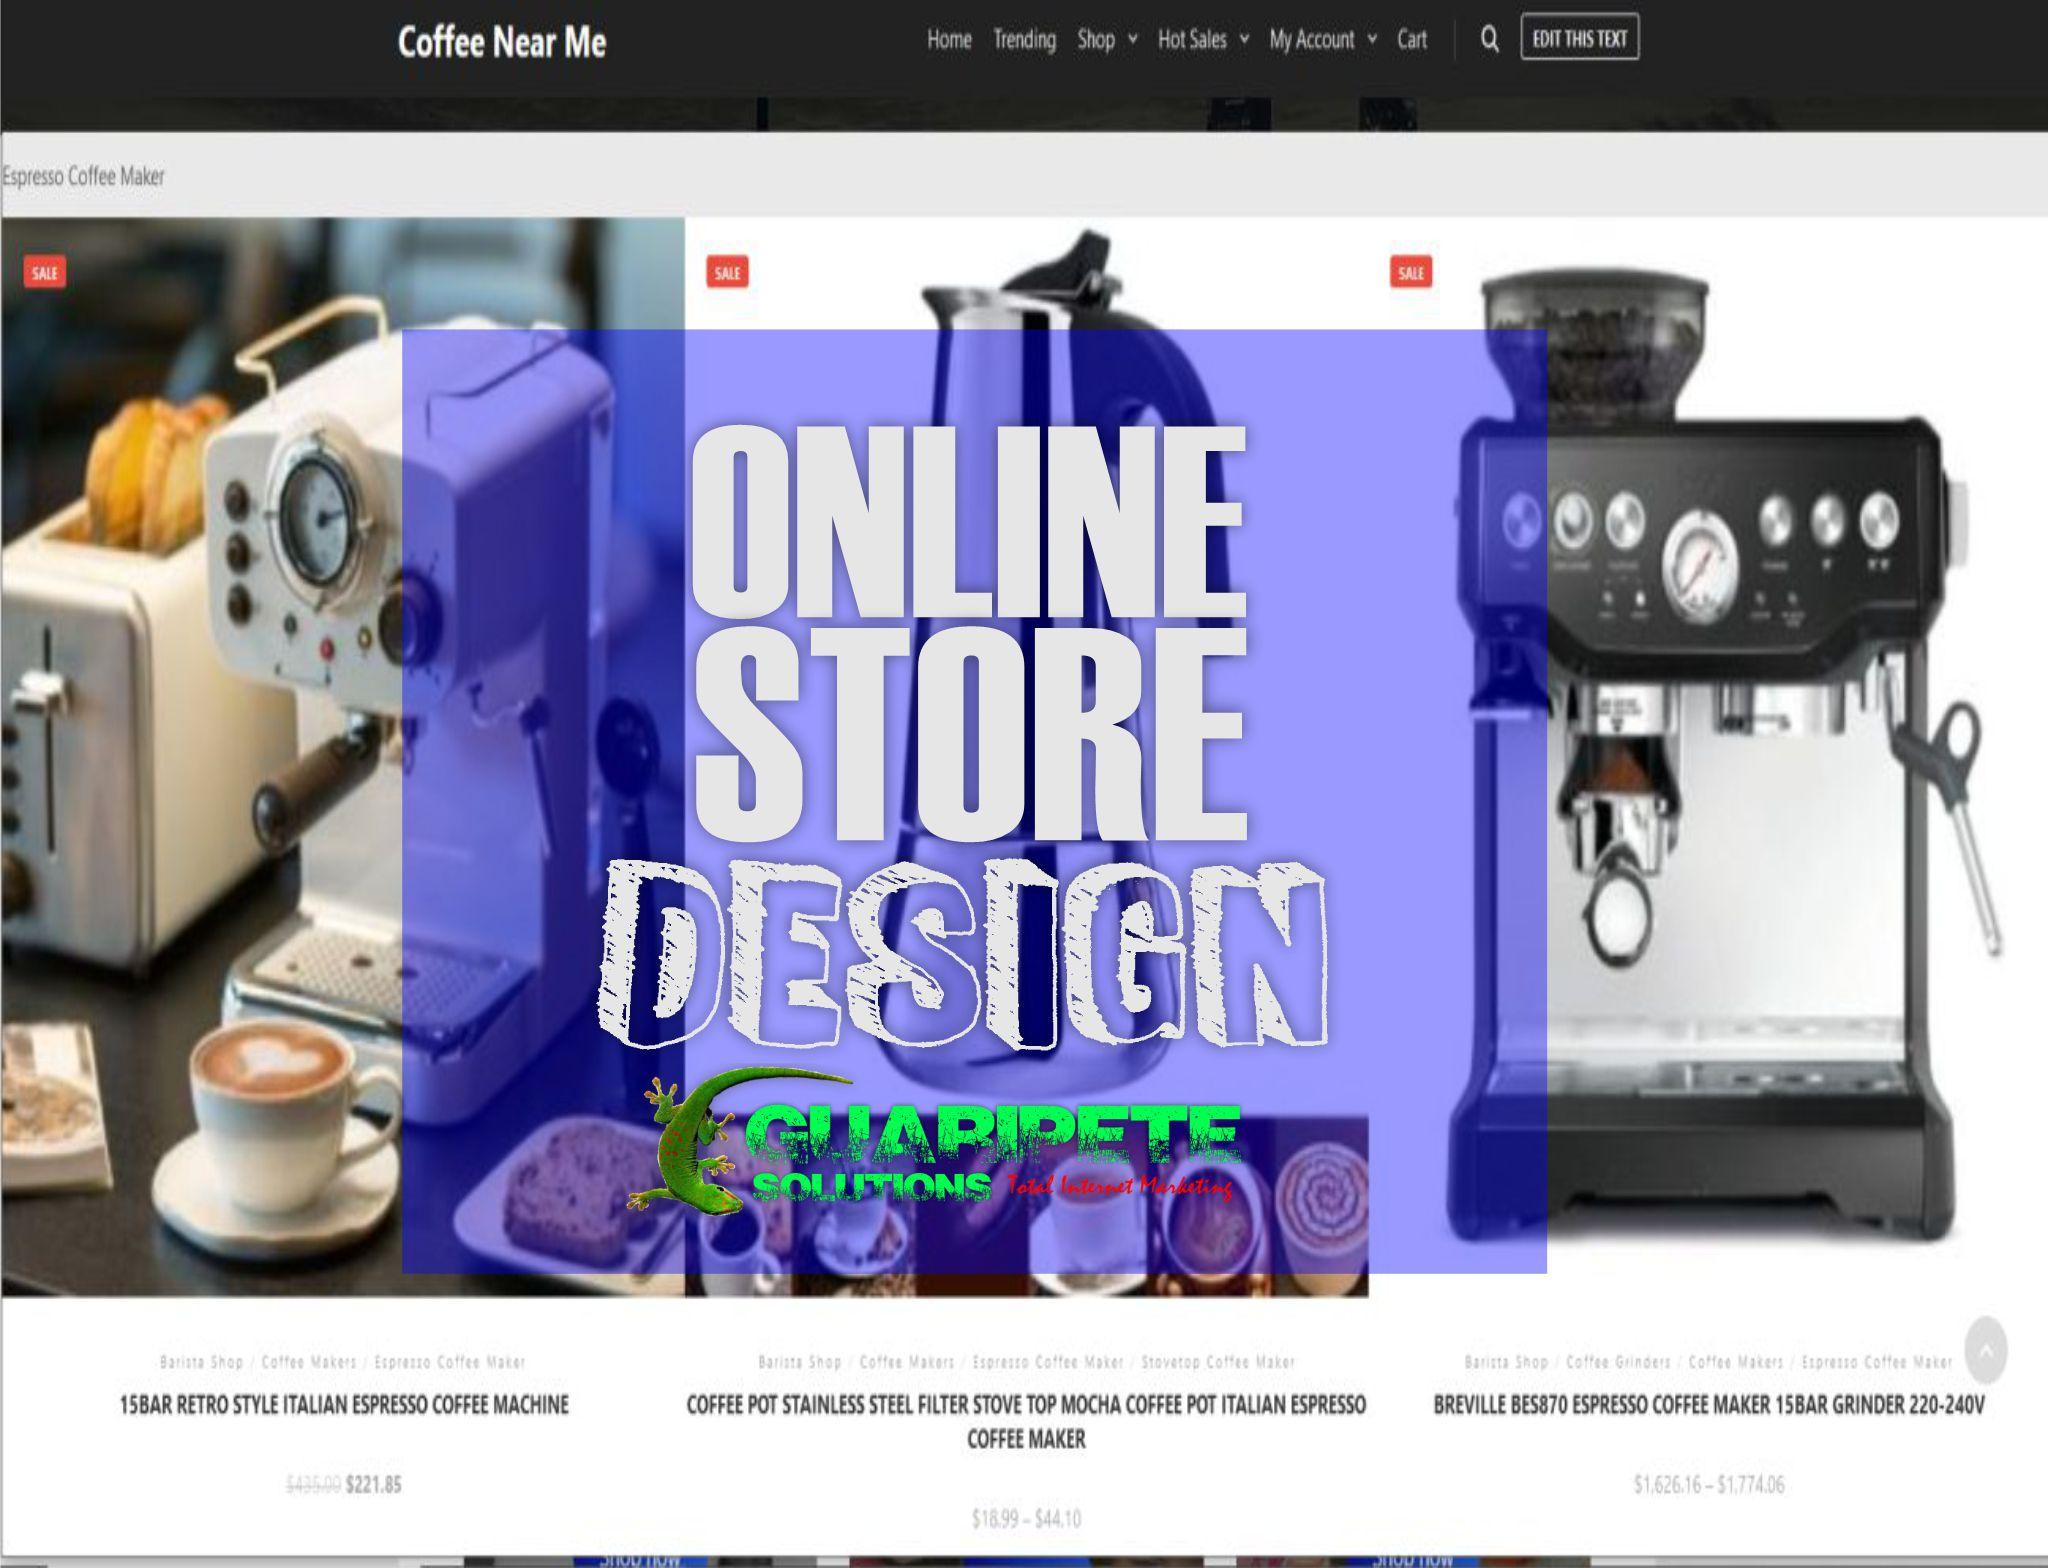 Online Store Design Coffee Secrets